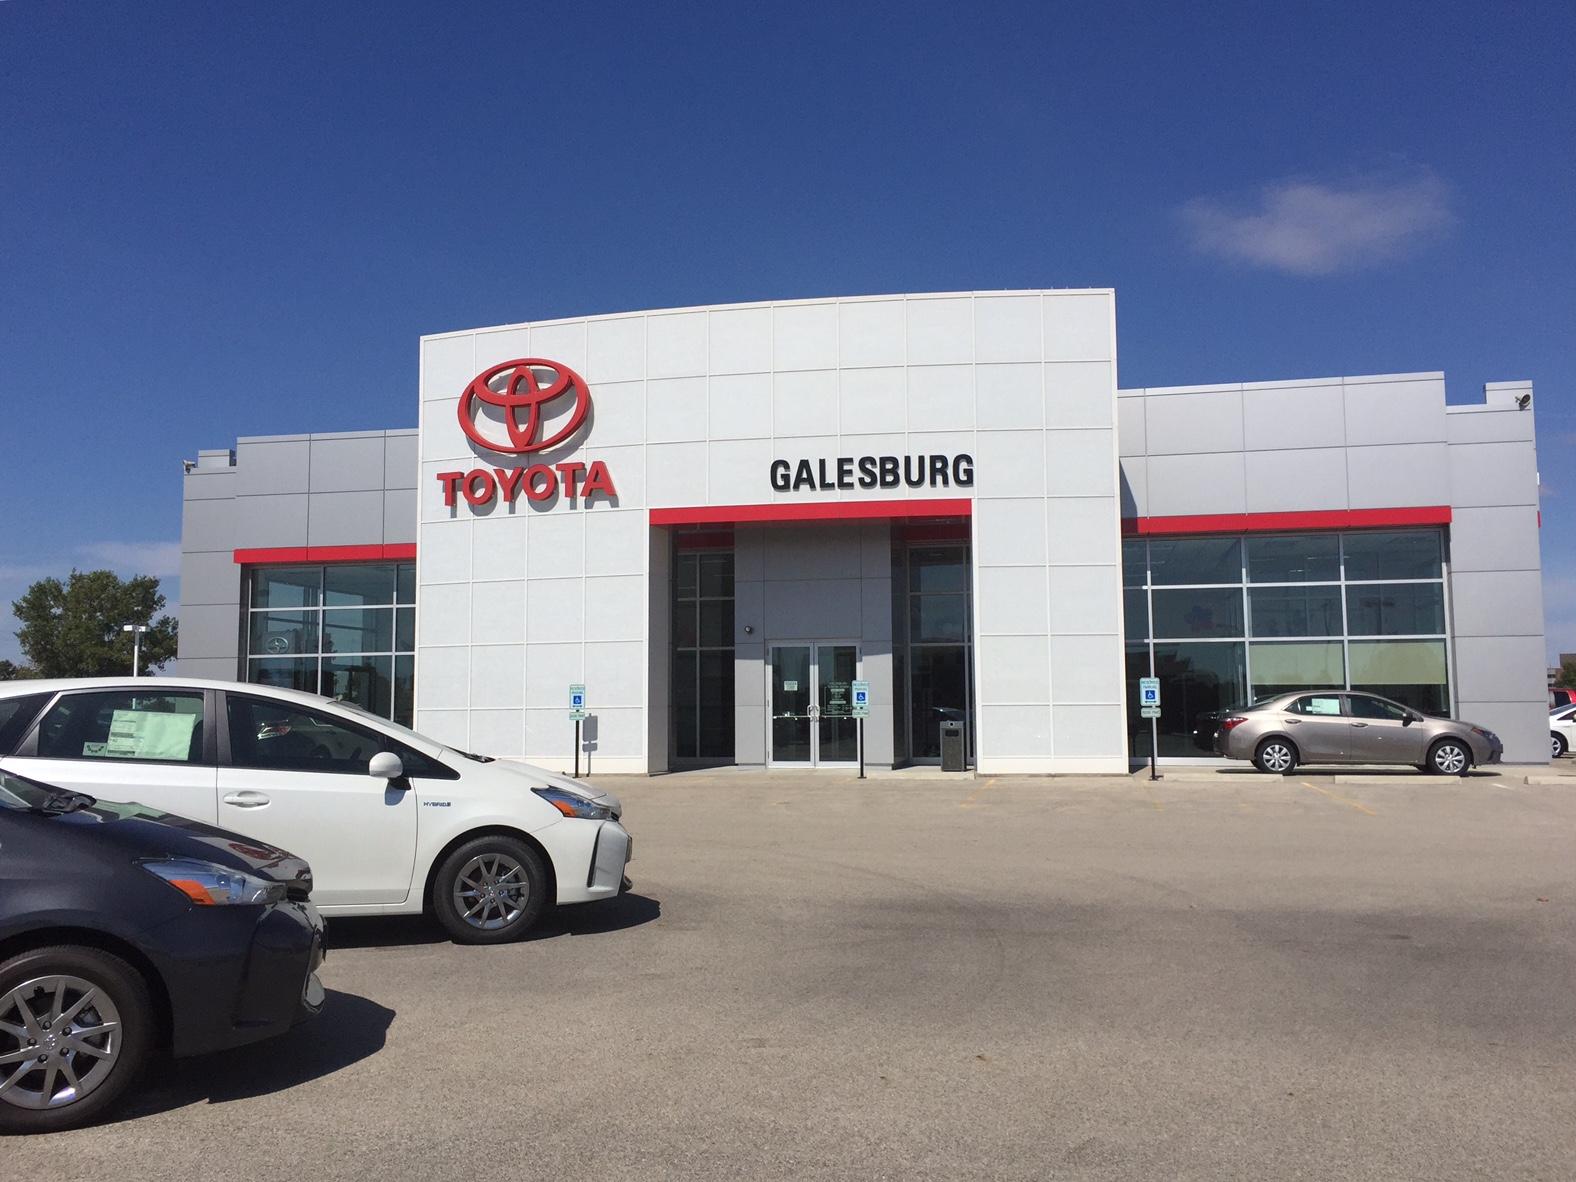 Galesburg Toyota - Honda, Galesburg IL